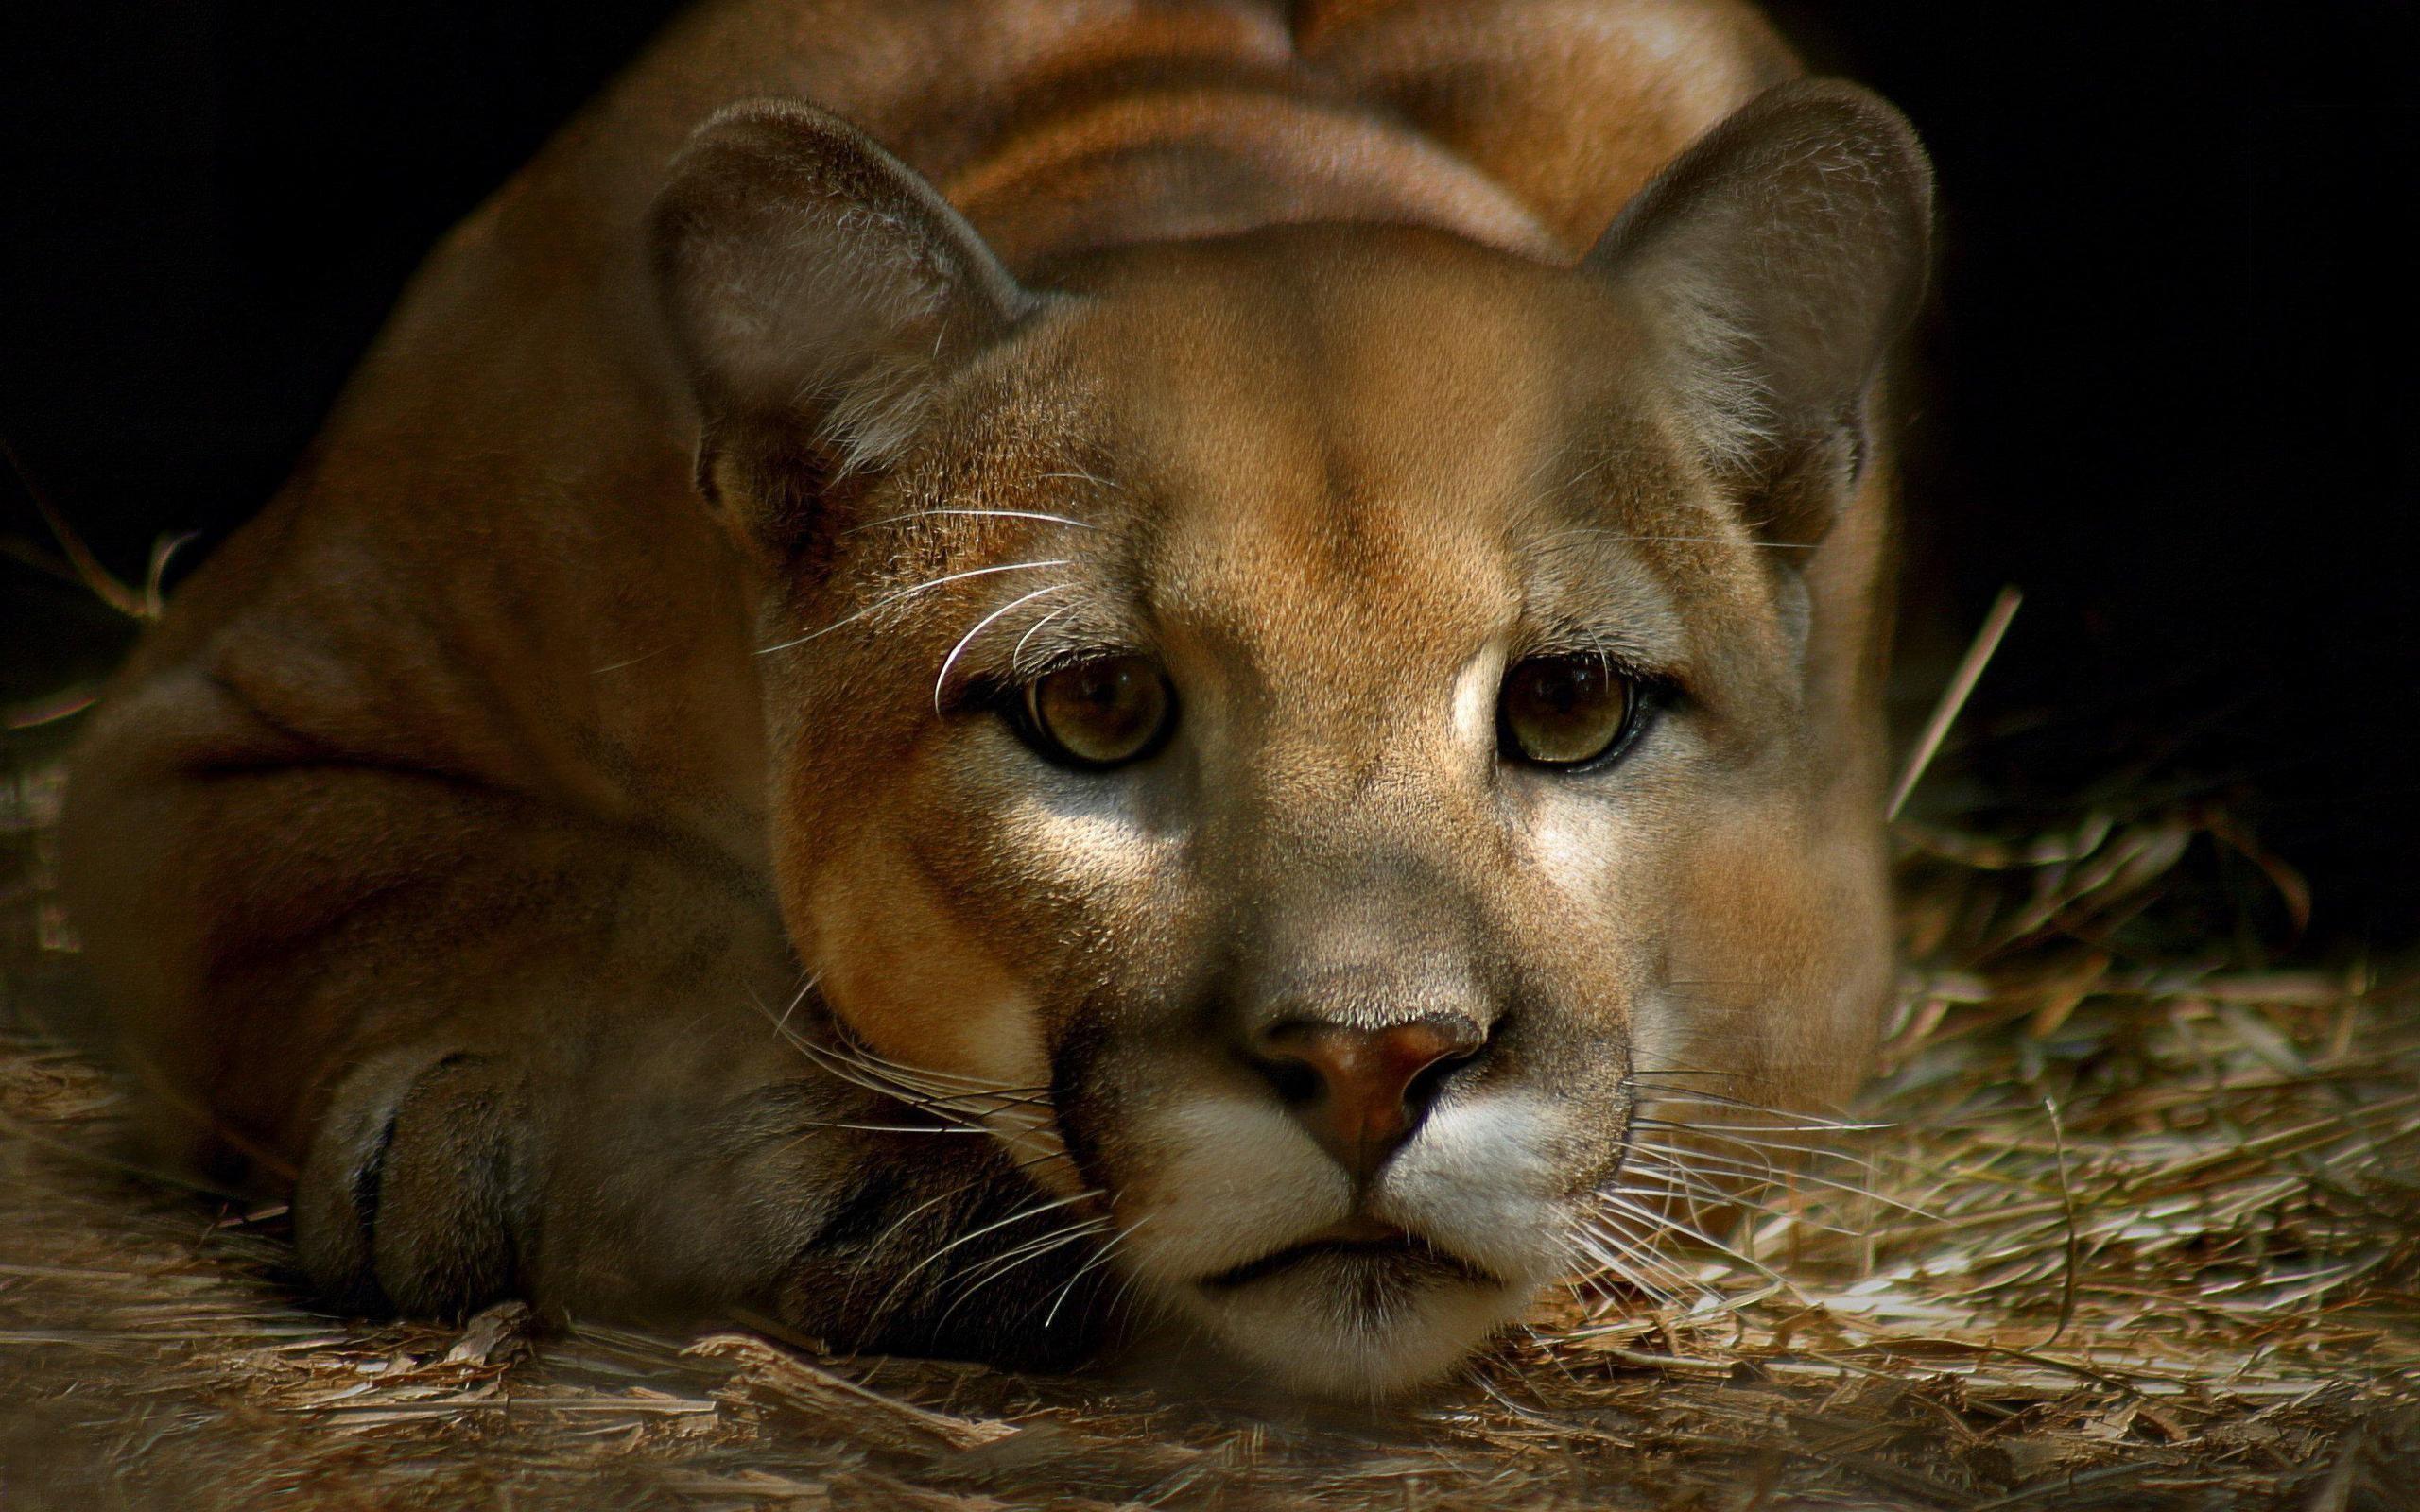 Cute Puma Animals Desktop Hd Iphone Ipad Wallpapers 2560x1600px